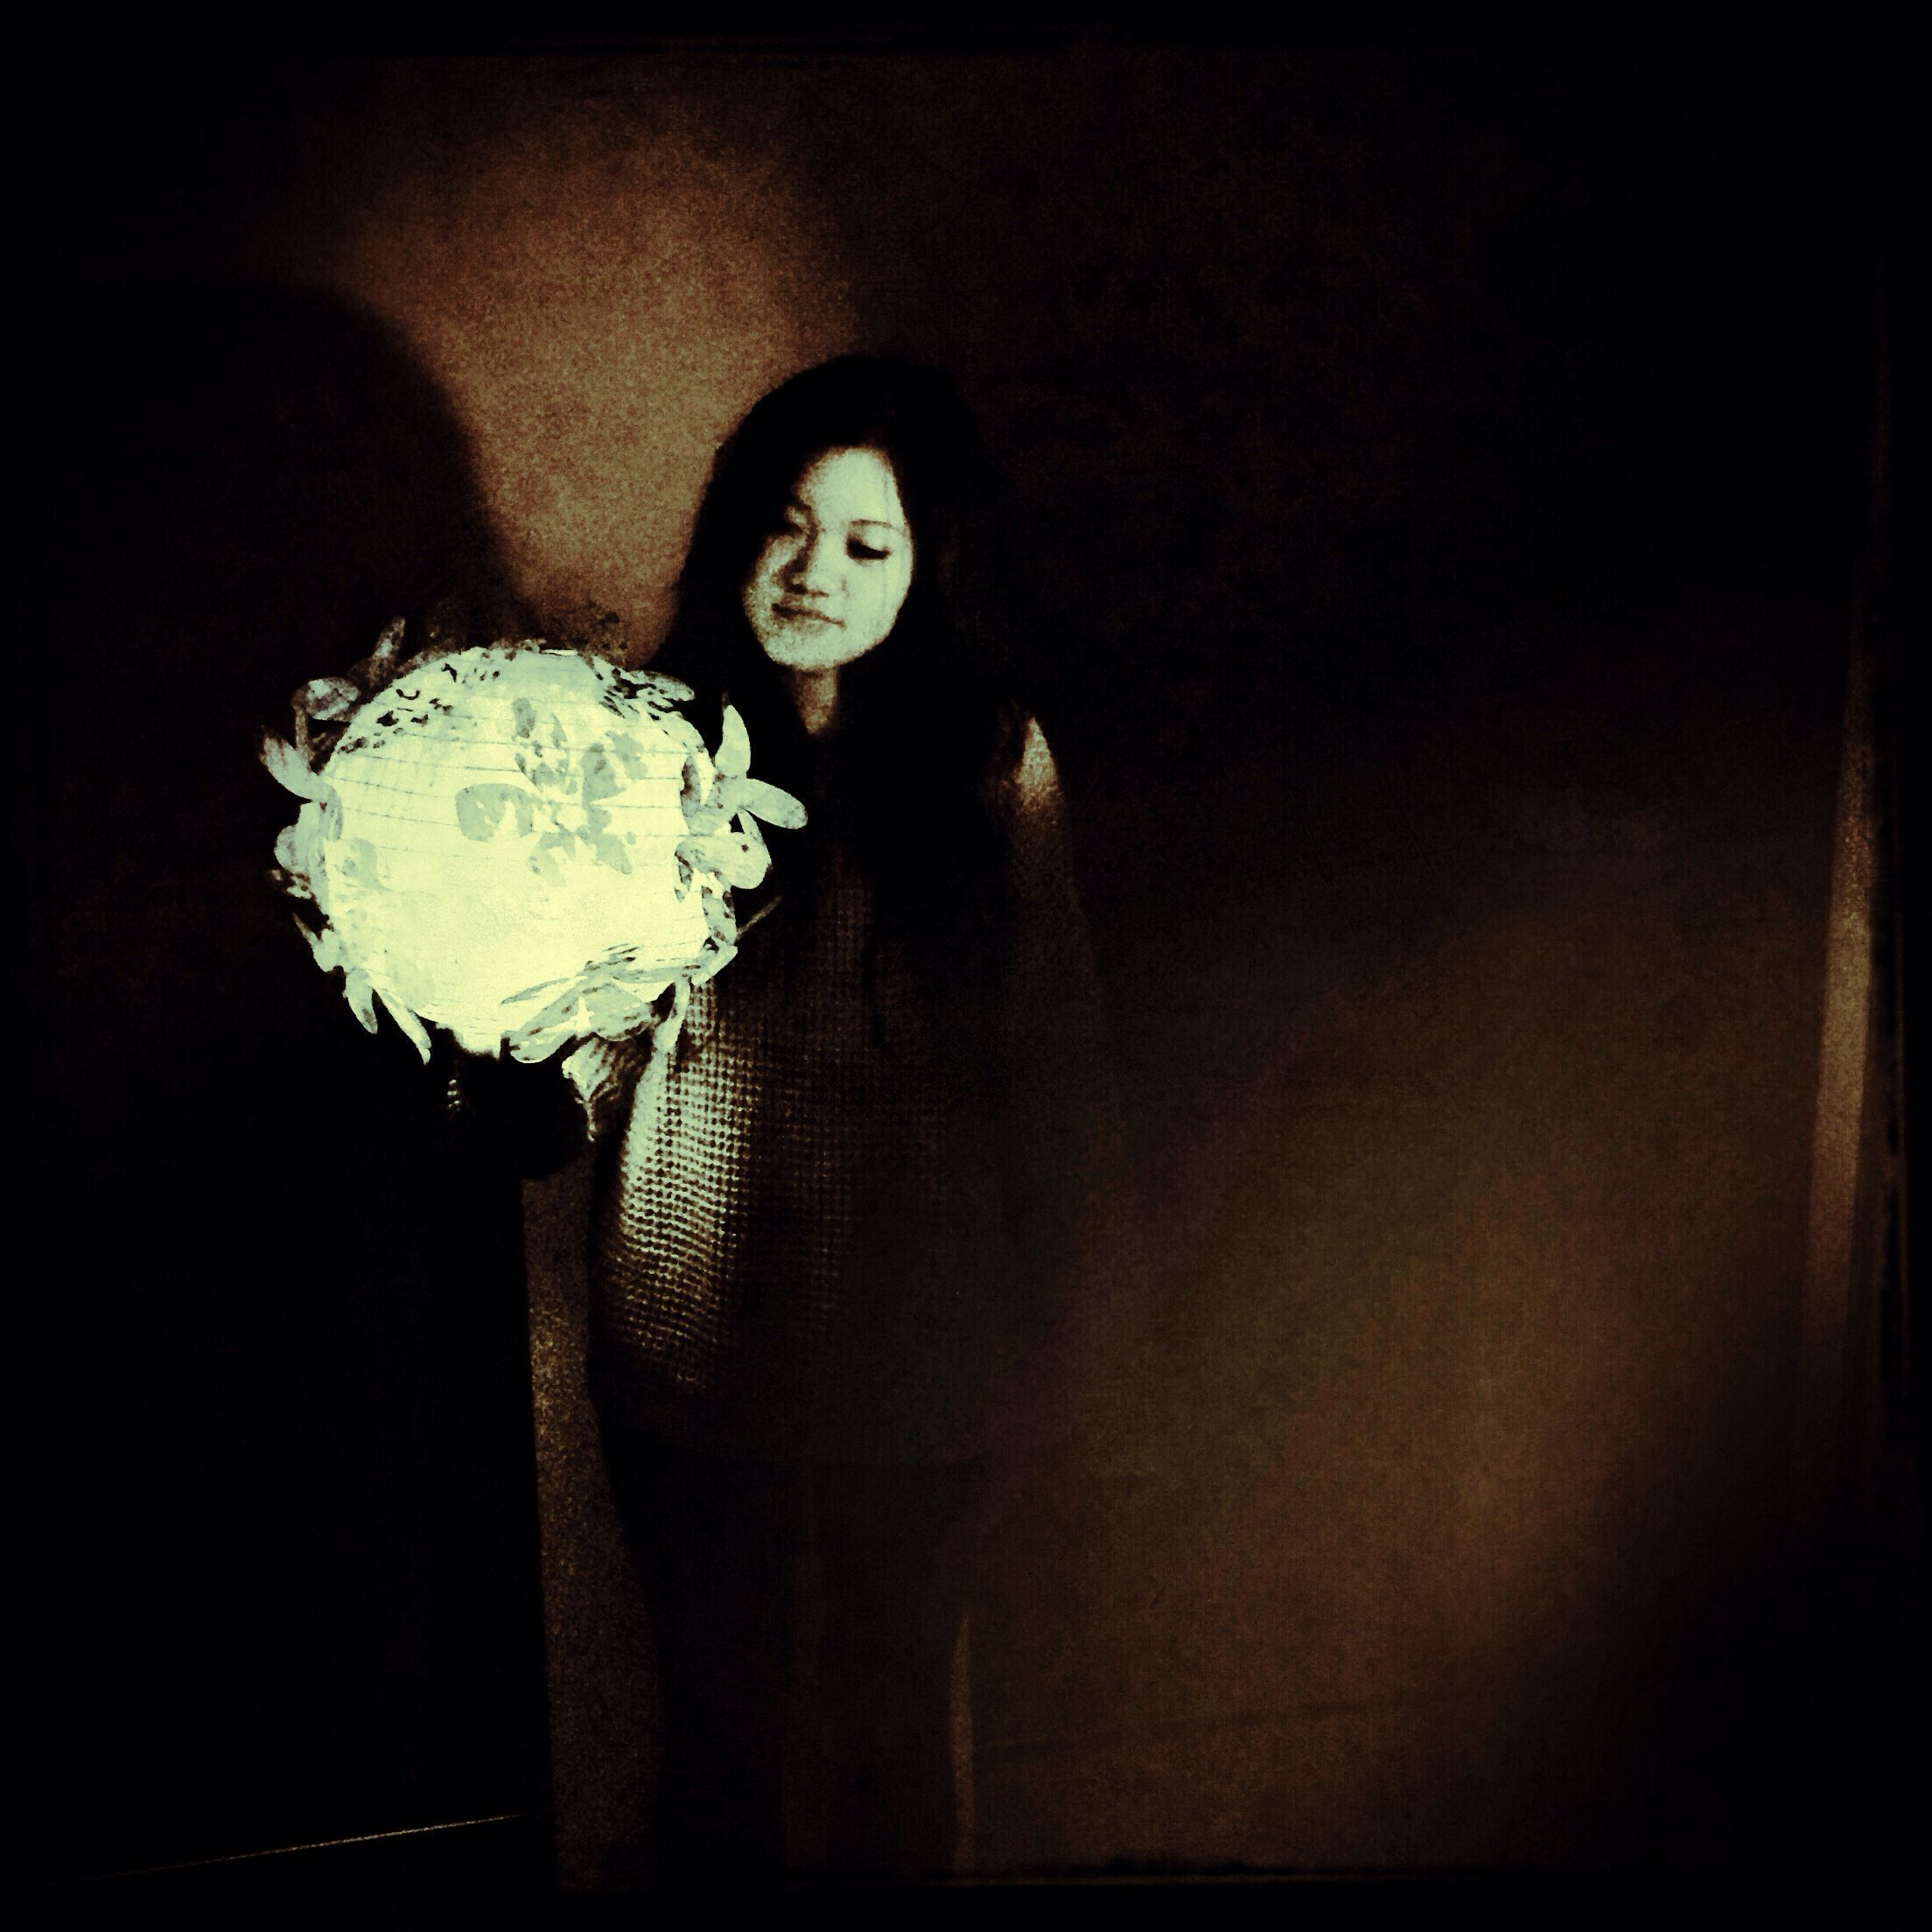 Flower paper lantern